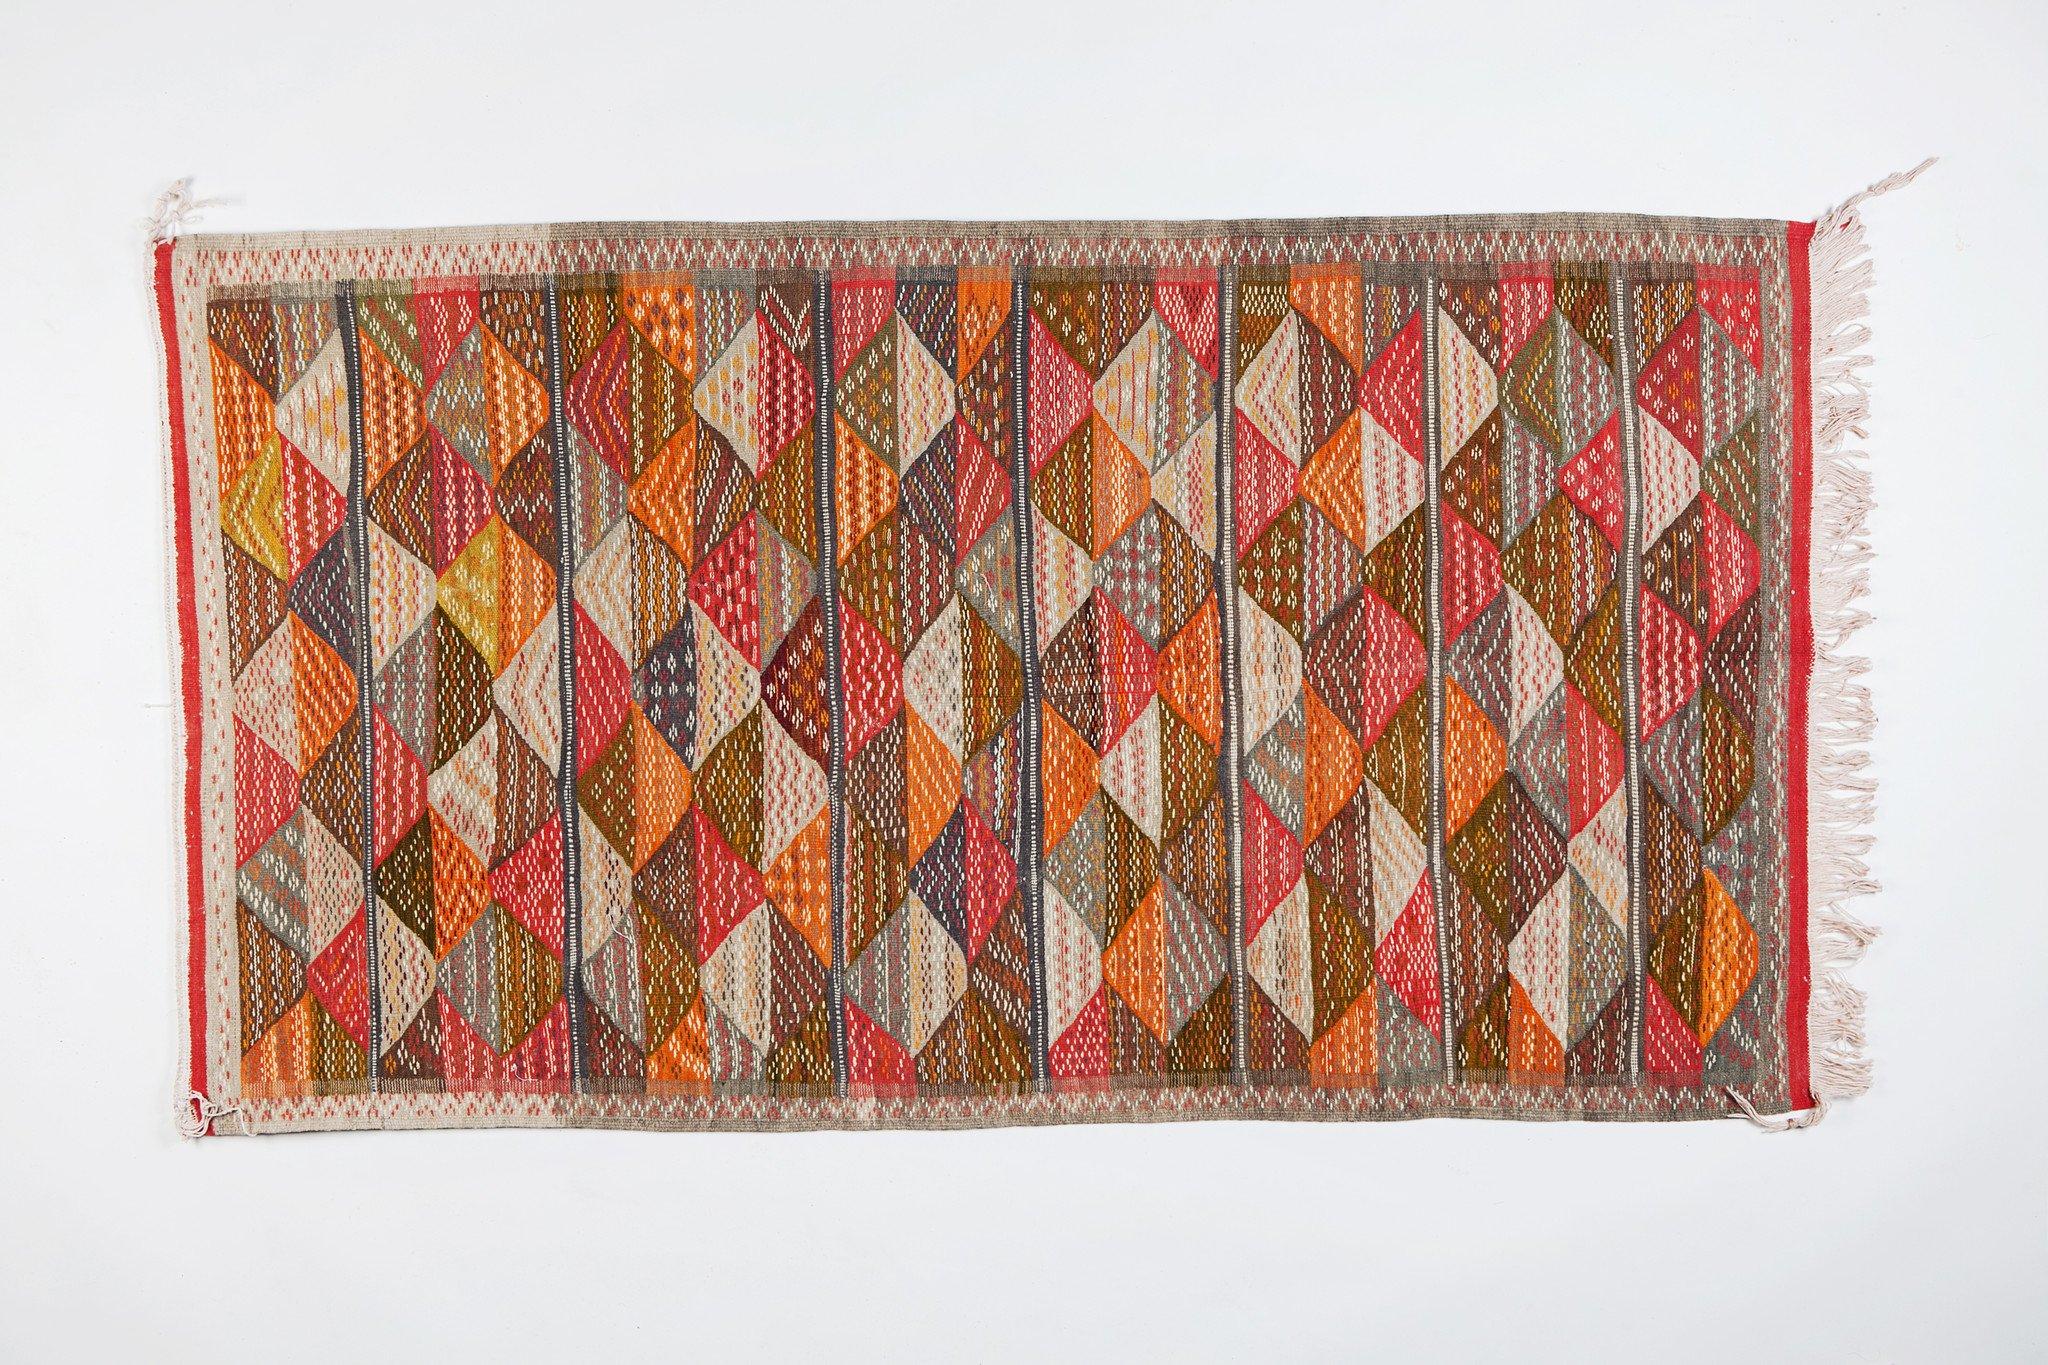 Berber Medium Rug - Triangle Patterns in Handwoven Wool & Organic Dye